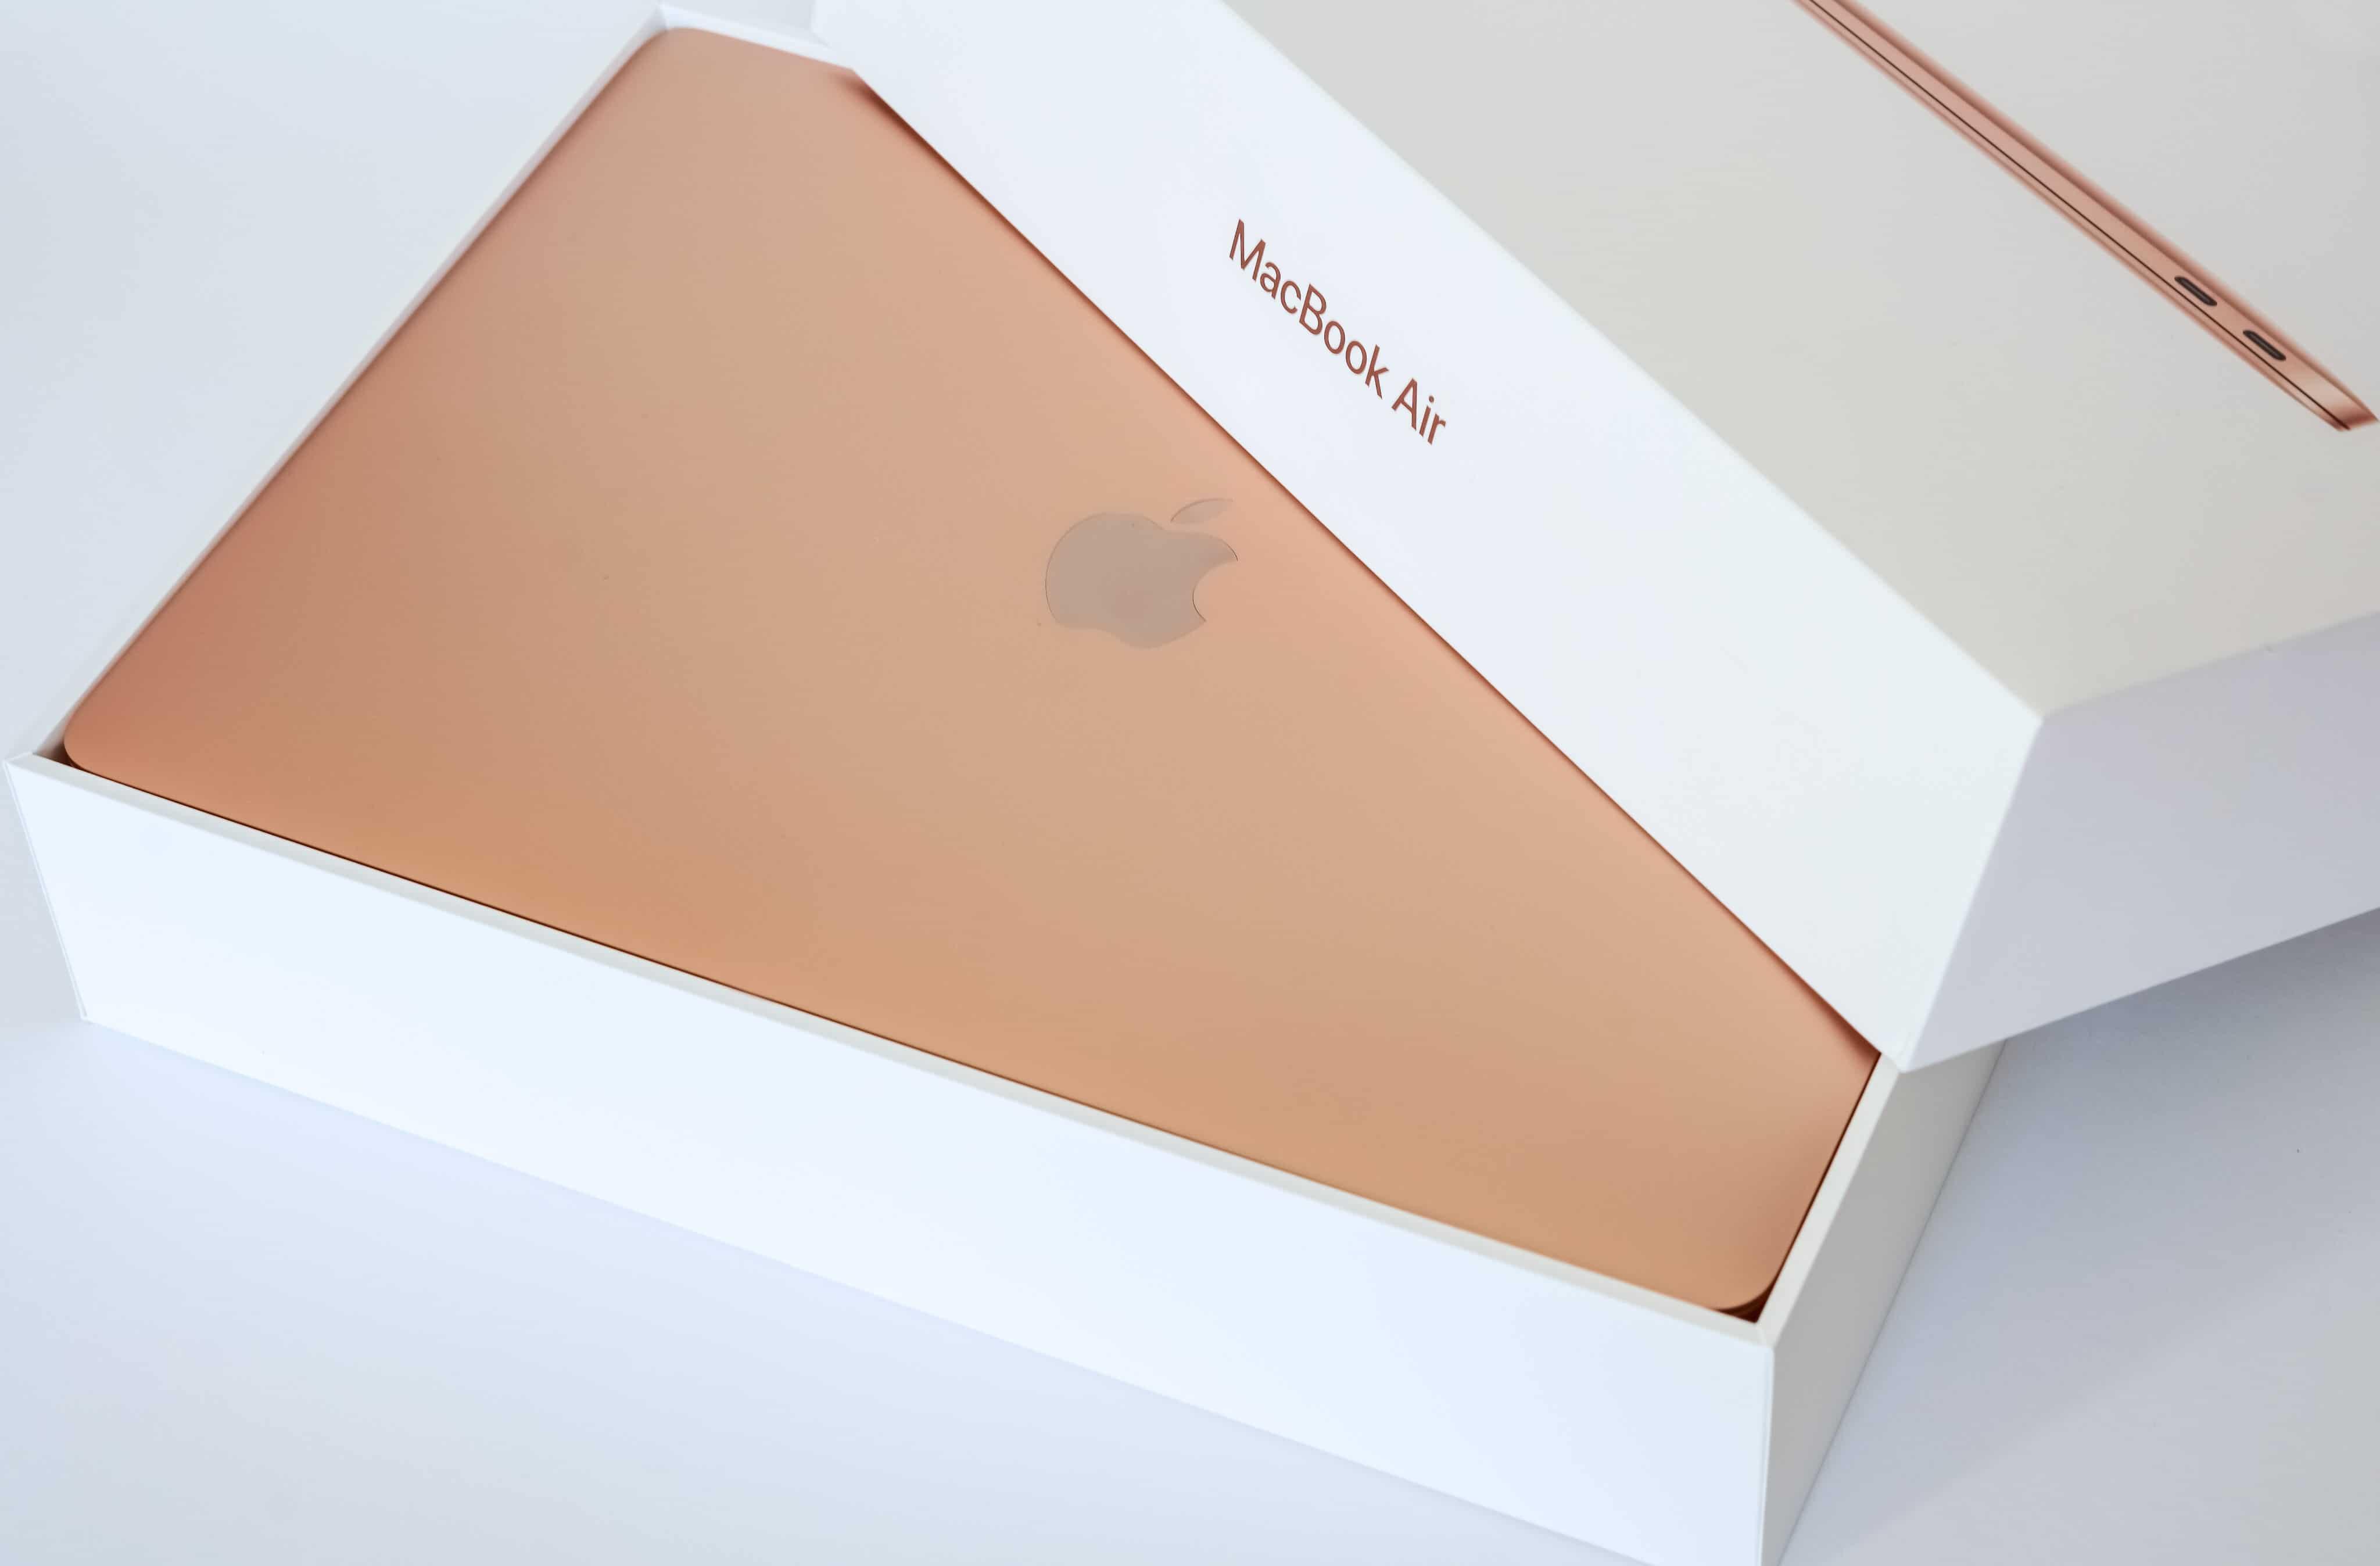 Caixa do MacBook Air